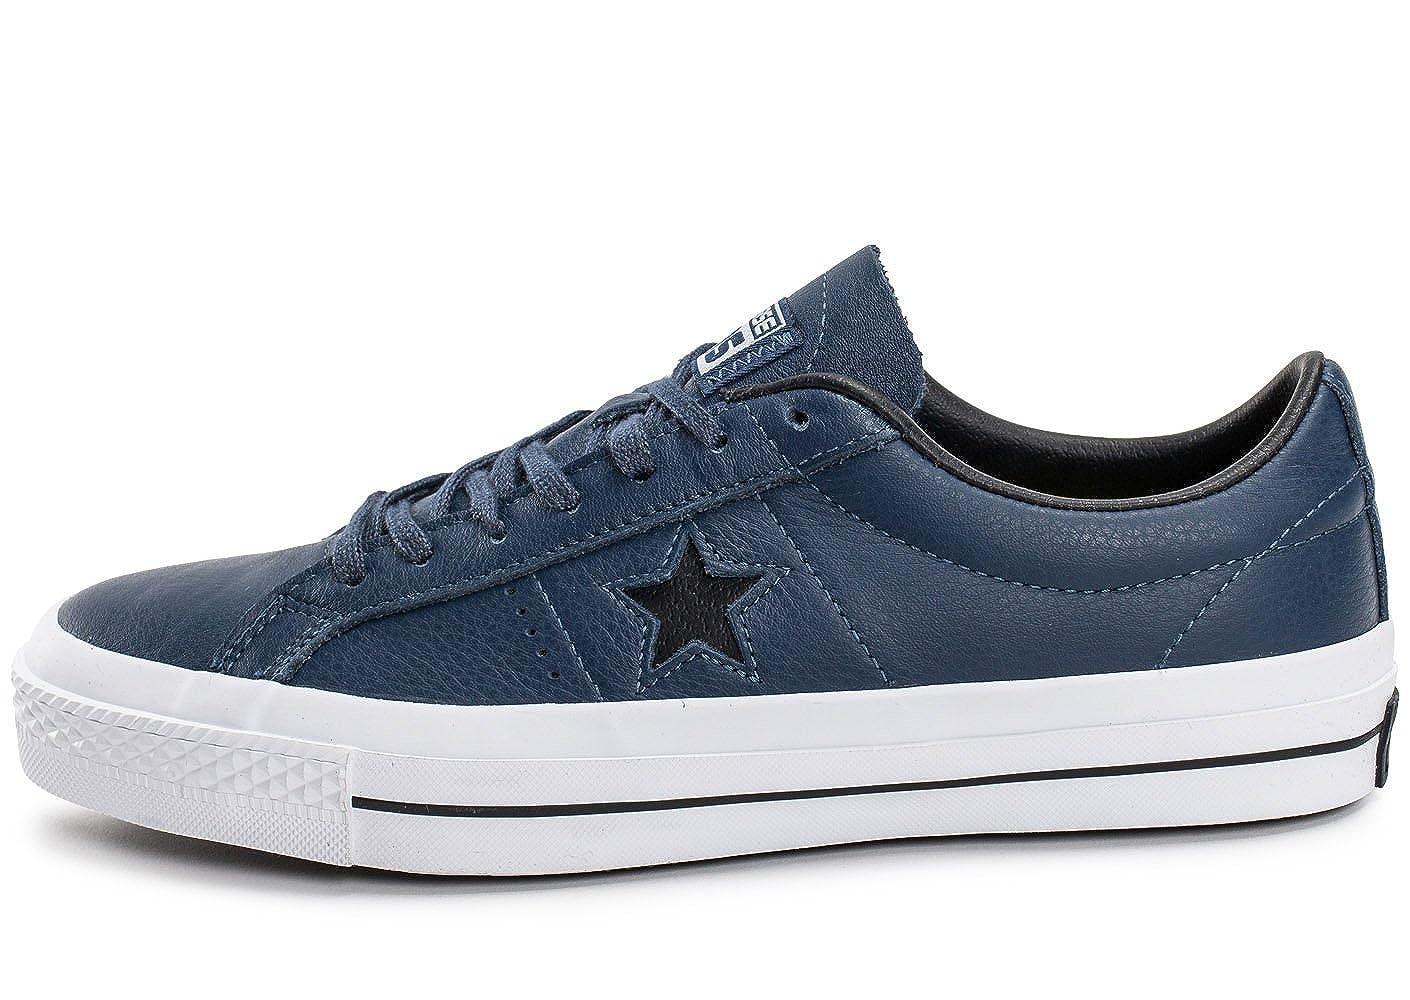 Converse One Star Star Star Leather Bleu Marine Bleu 44 eb6063